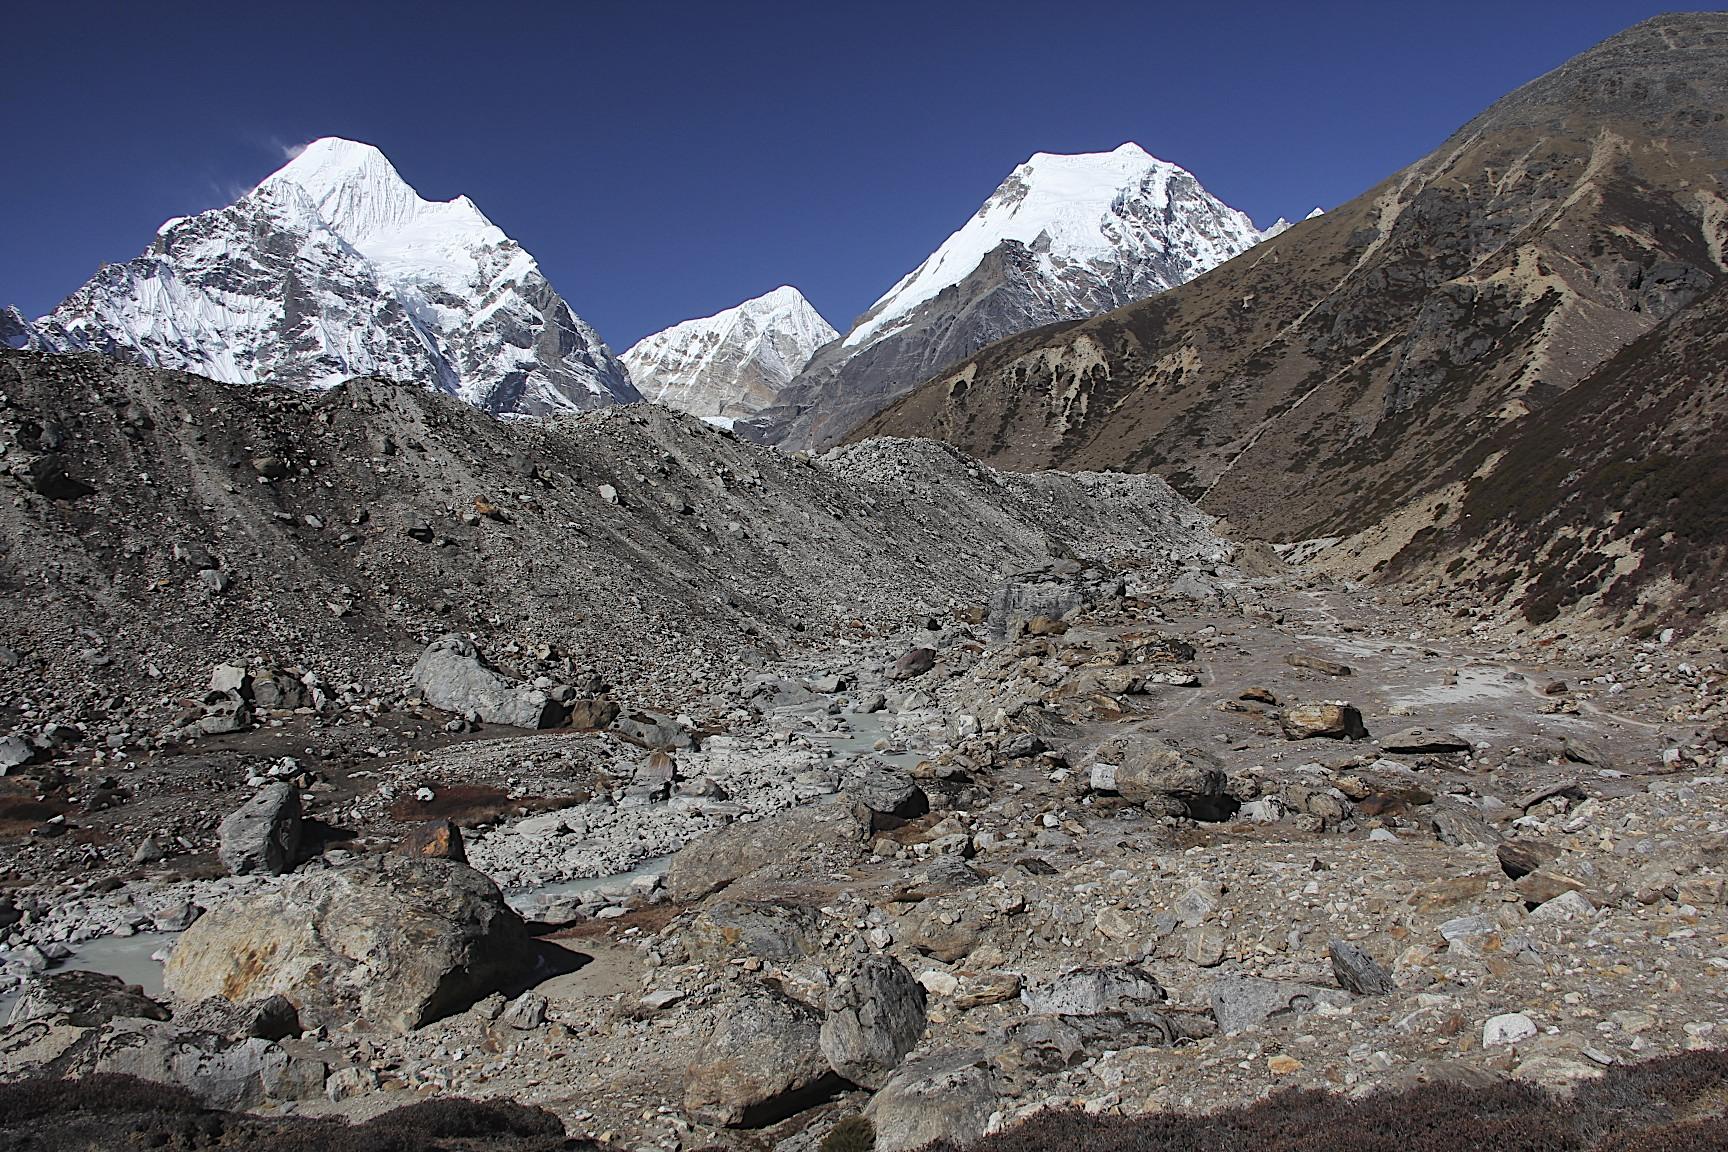 Mt. Chamlang and Lower Barun Glacier